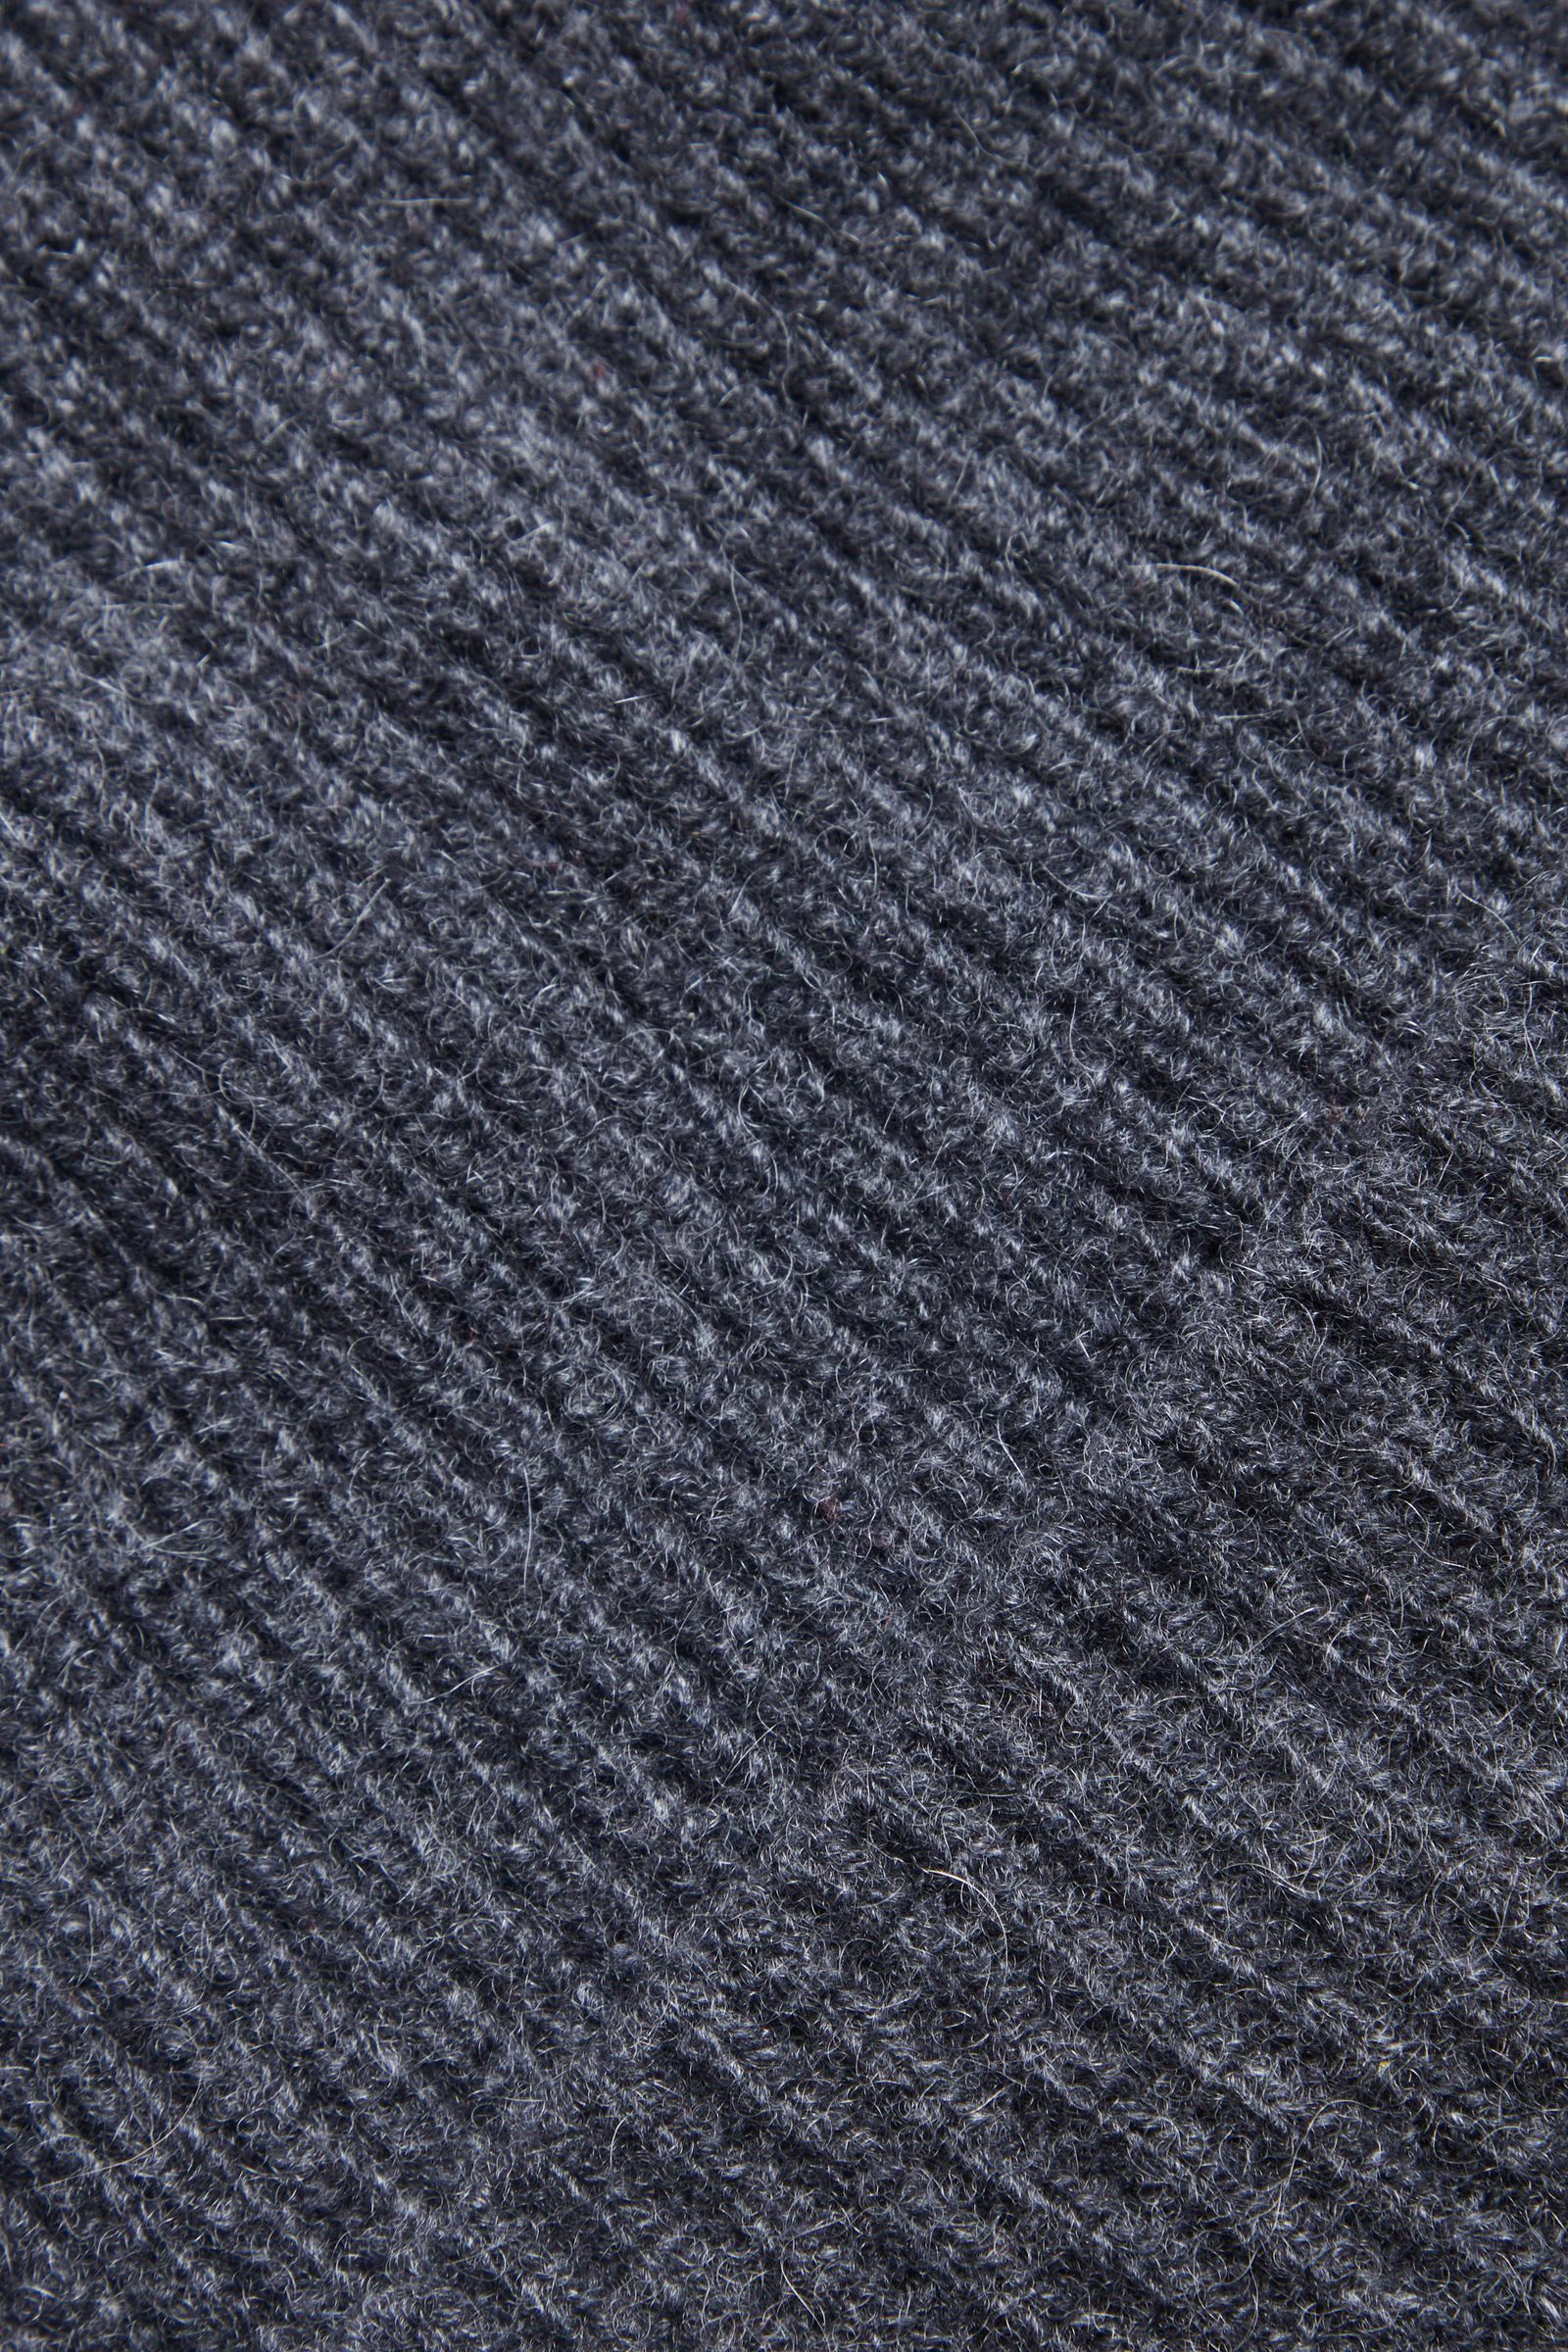 COS 오버사이즈 캐시미어 햇의 그레이컬러 Detail입니다.